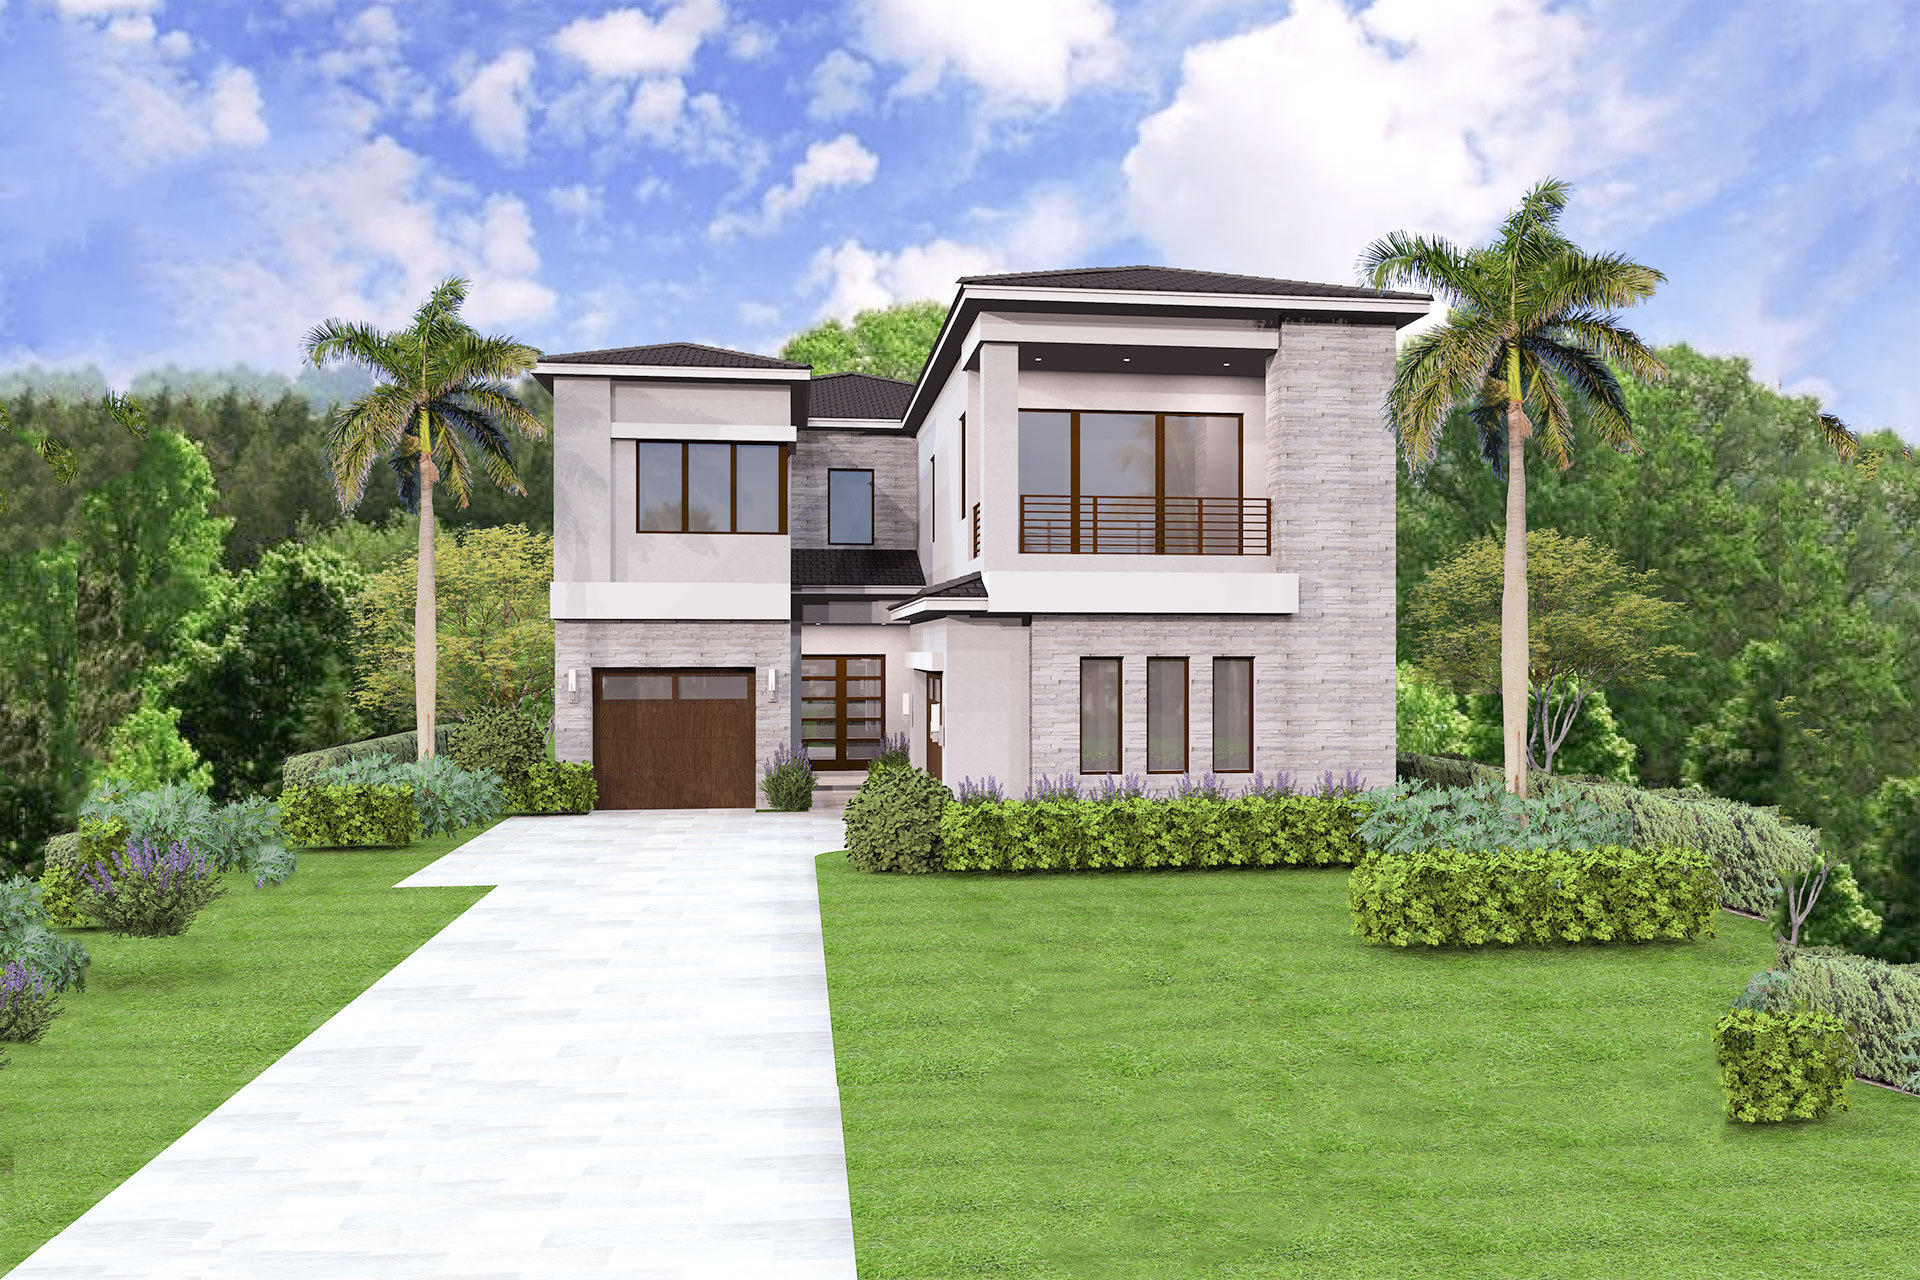 Home for sale in Boca Bridges Boca Raton Florida